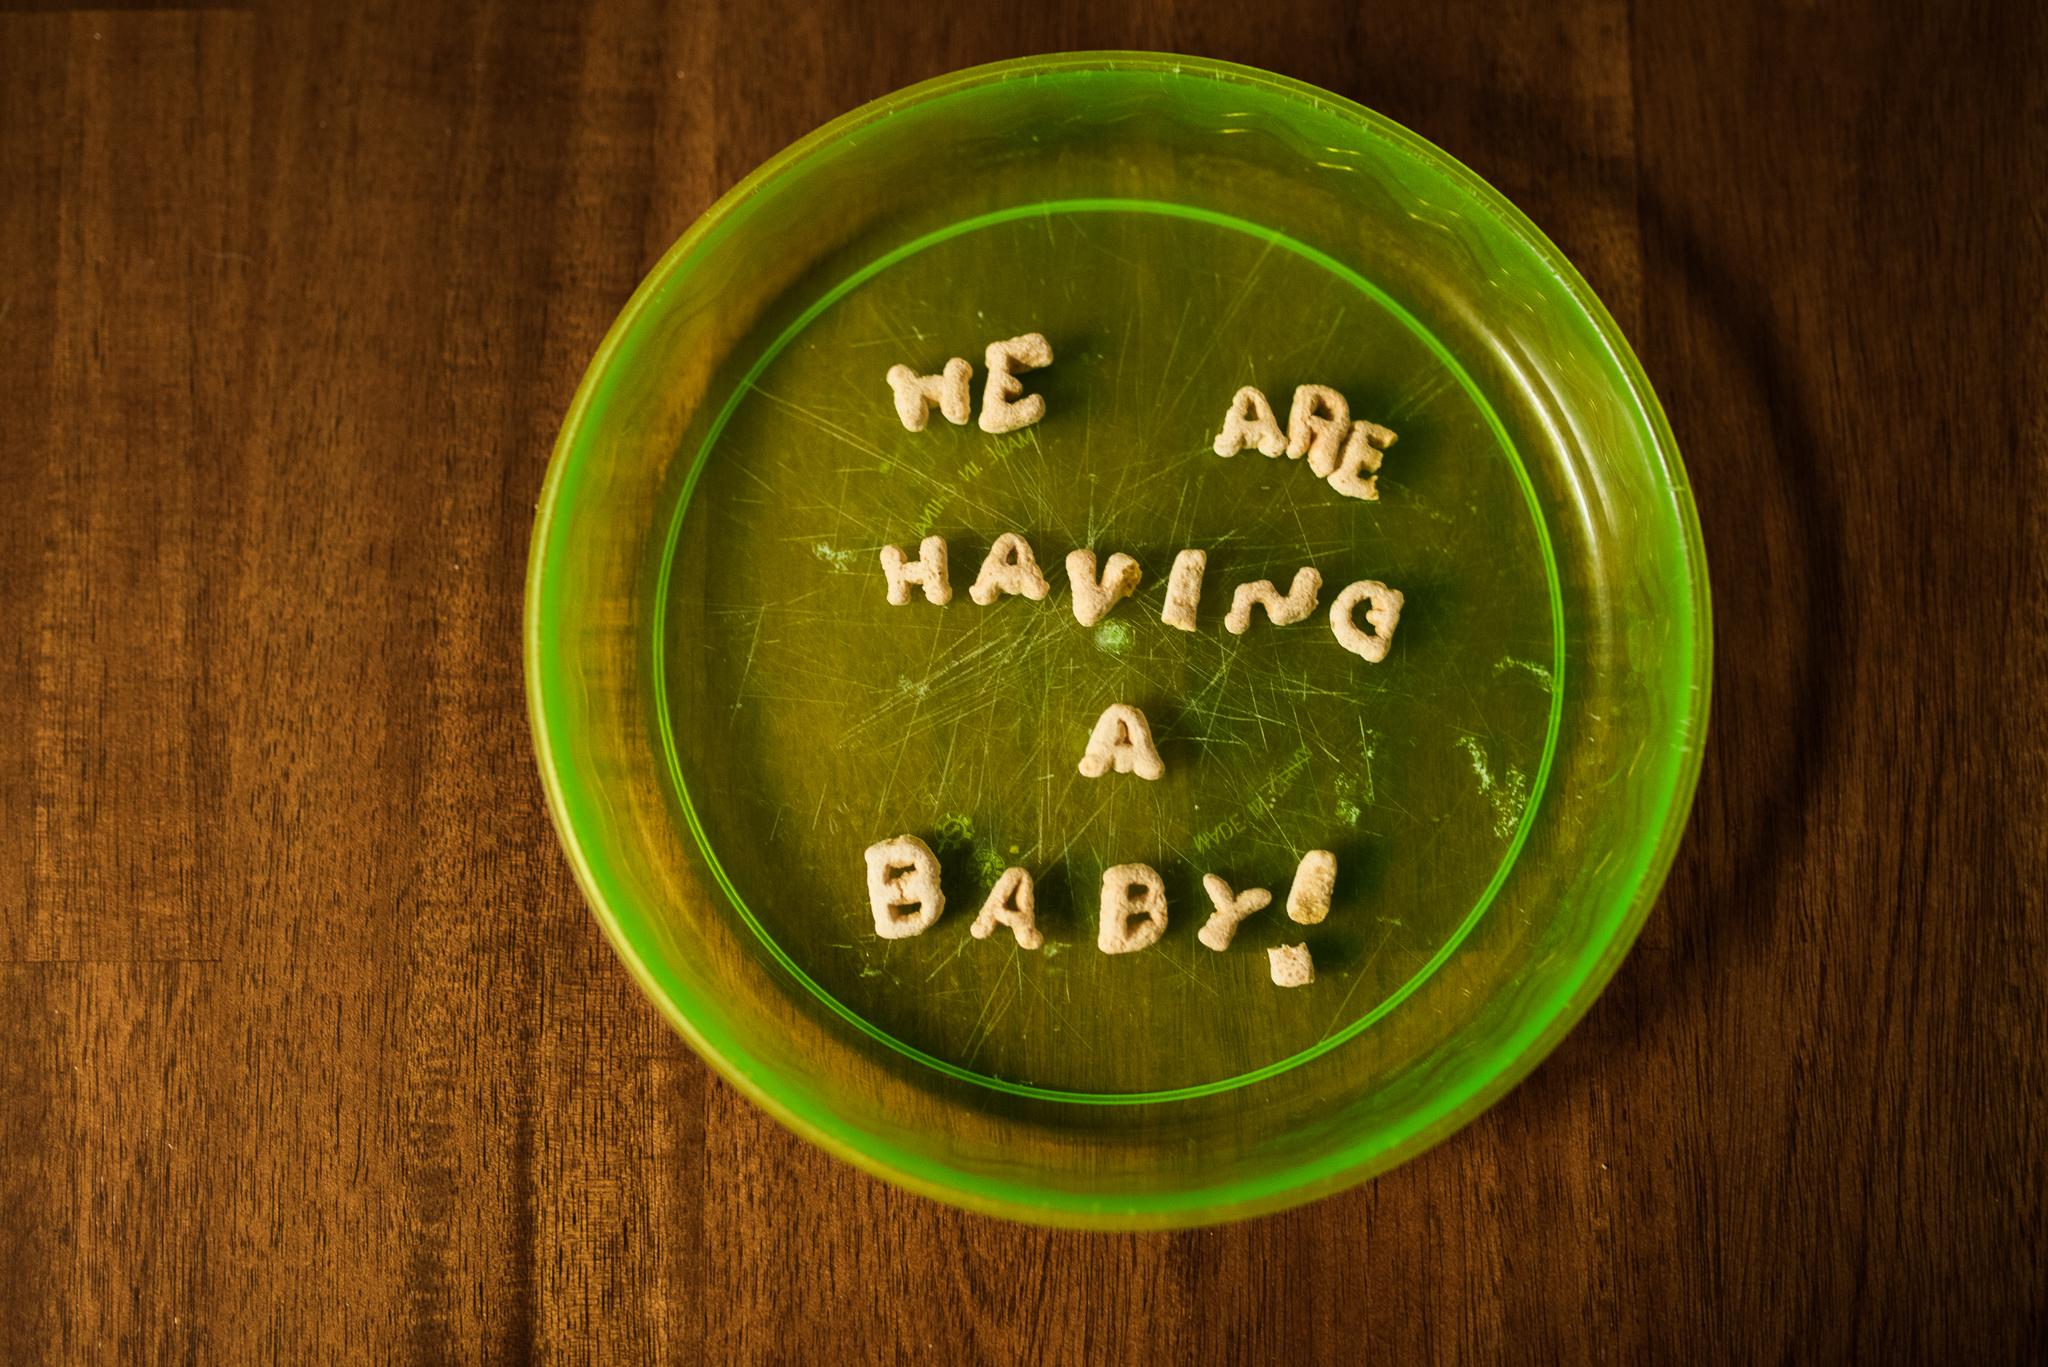 pregnancy announcement fun idea cereal having a baby